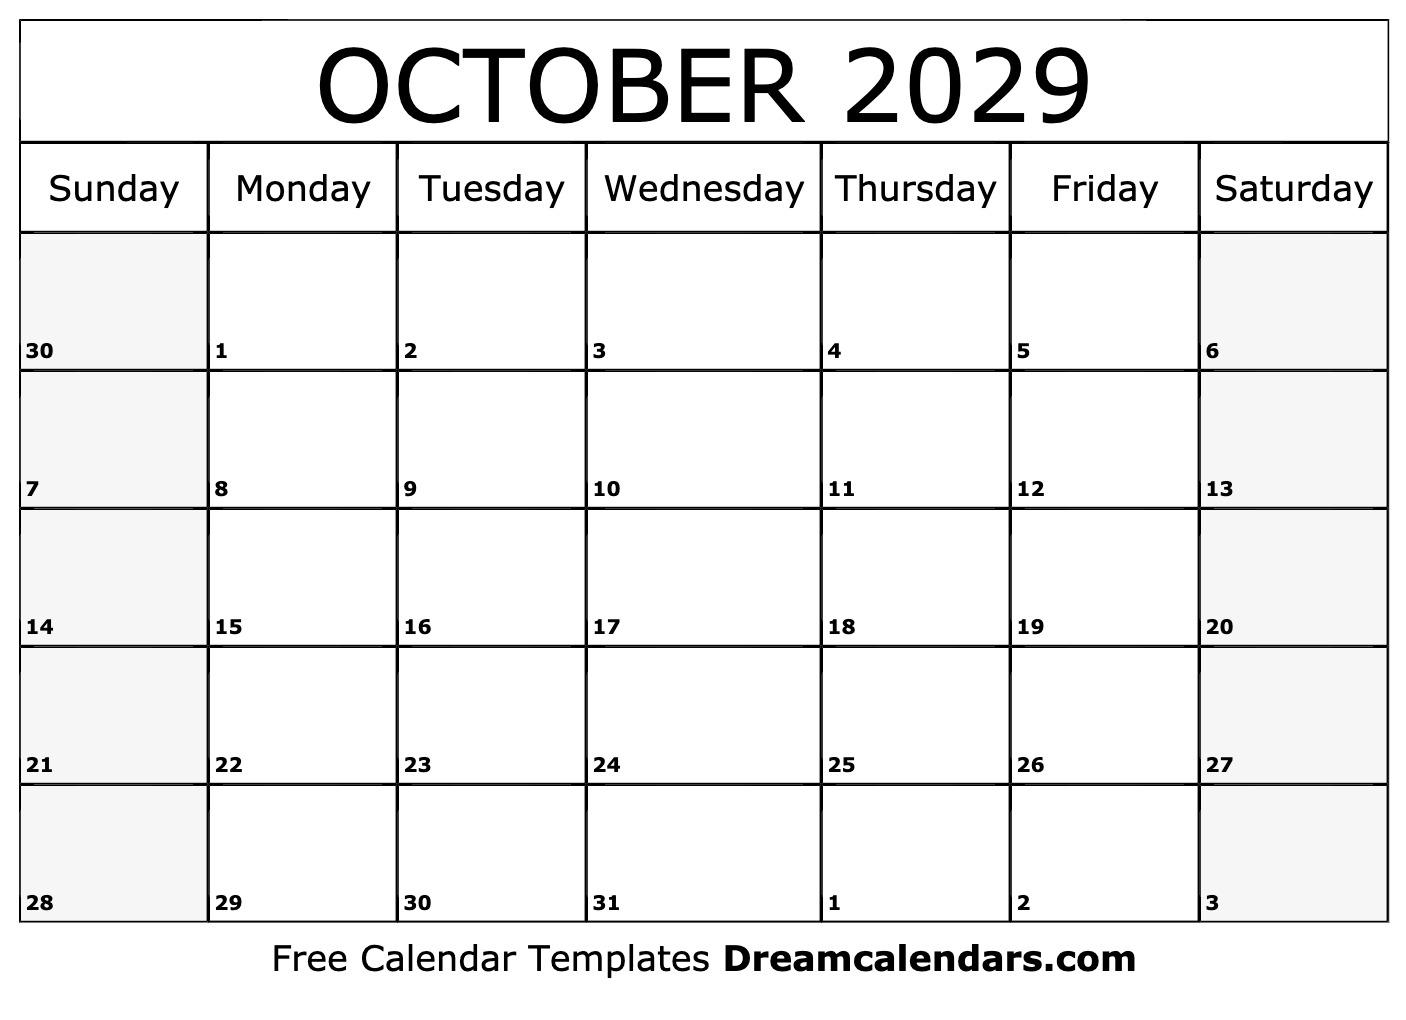 Free Blank October 2029 Printable Calendar